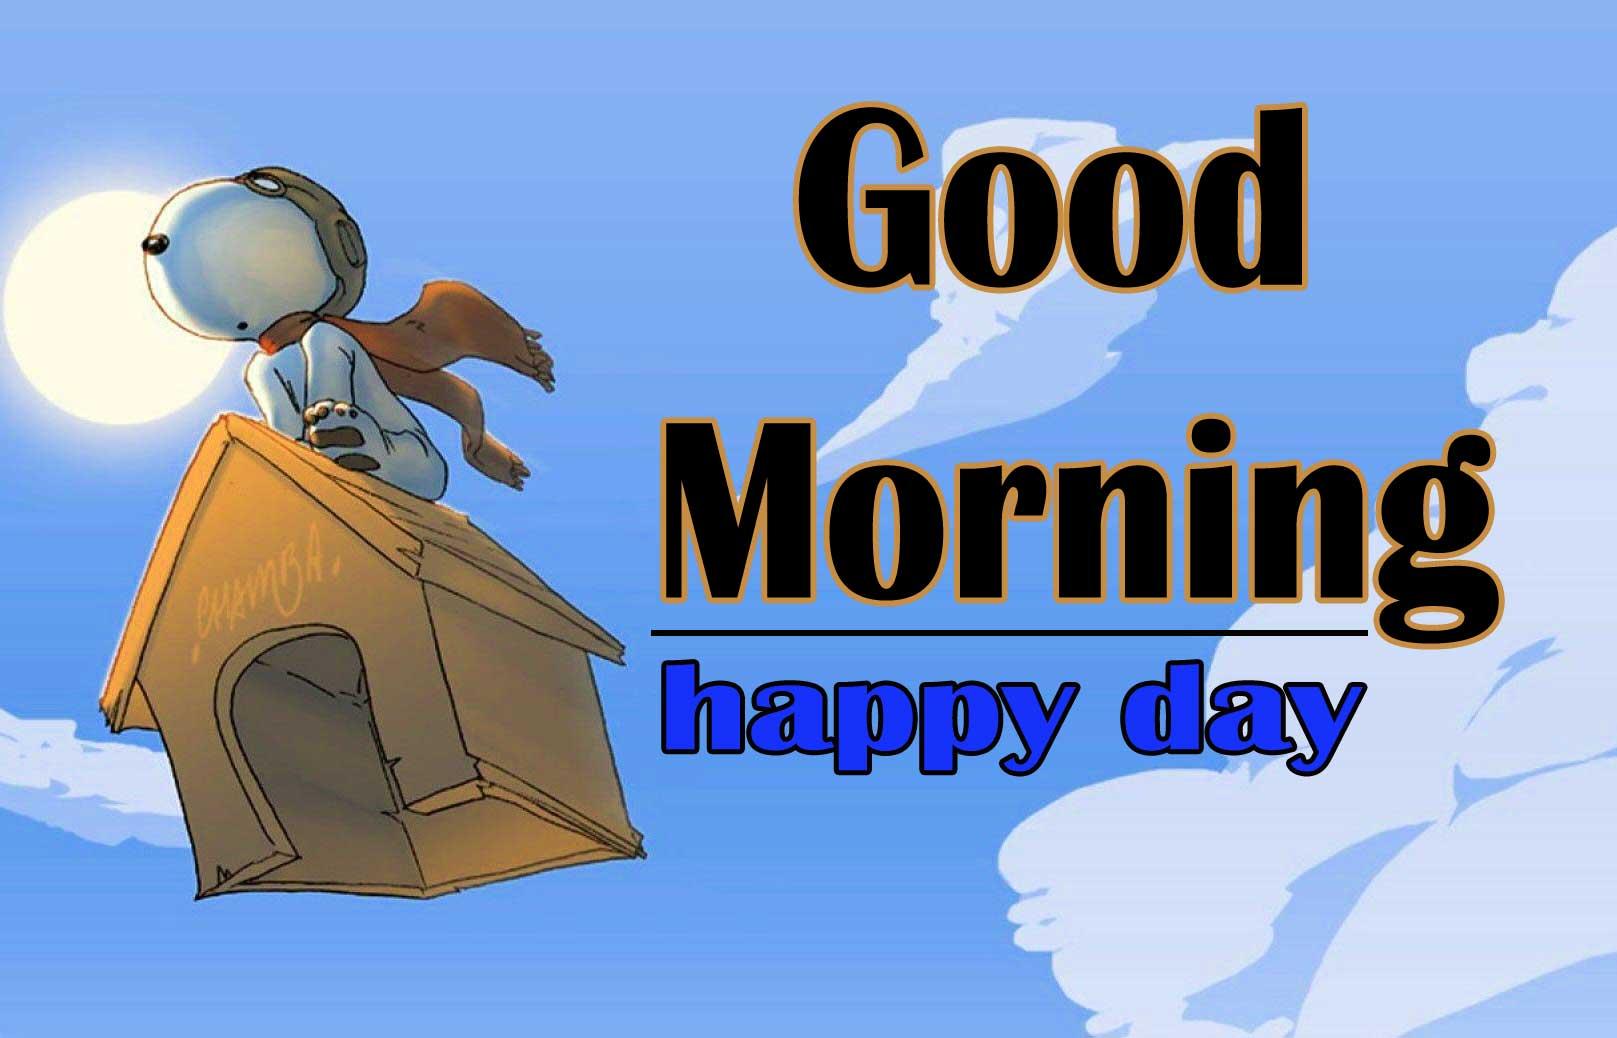 Snoopy good Morning 19